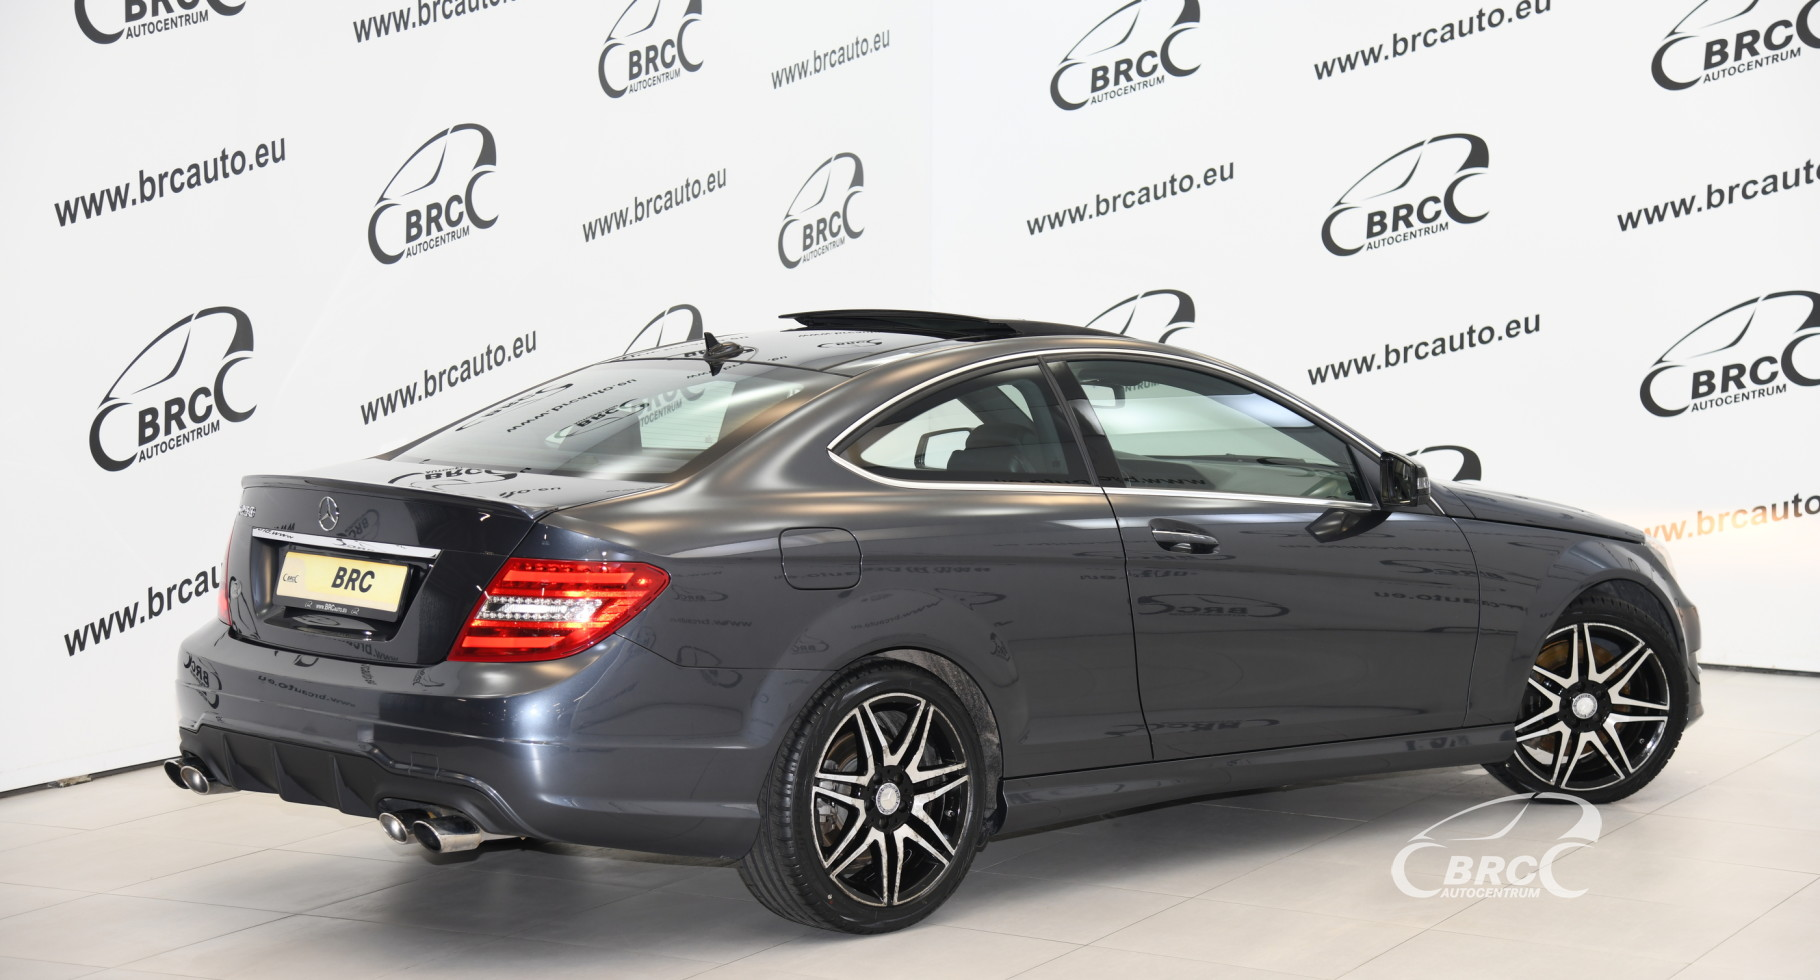 Mercedes-Benz C 250 i Coupe Automatas